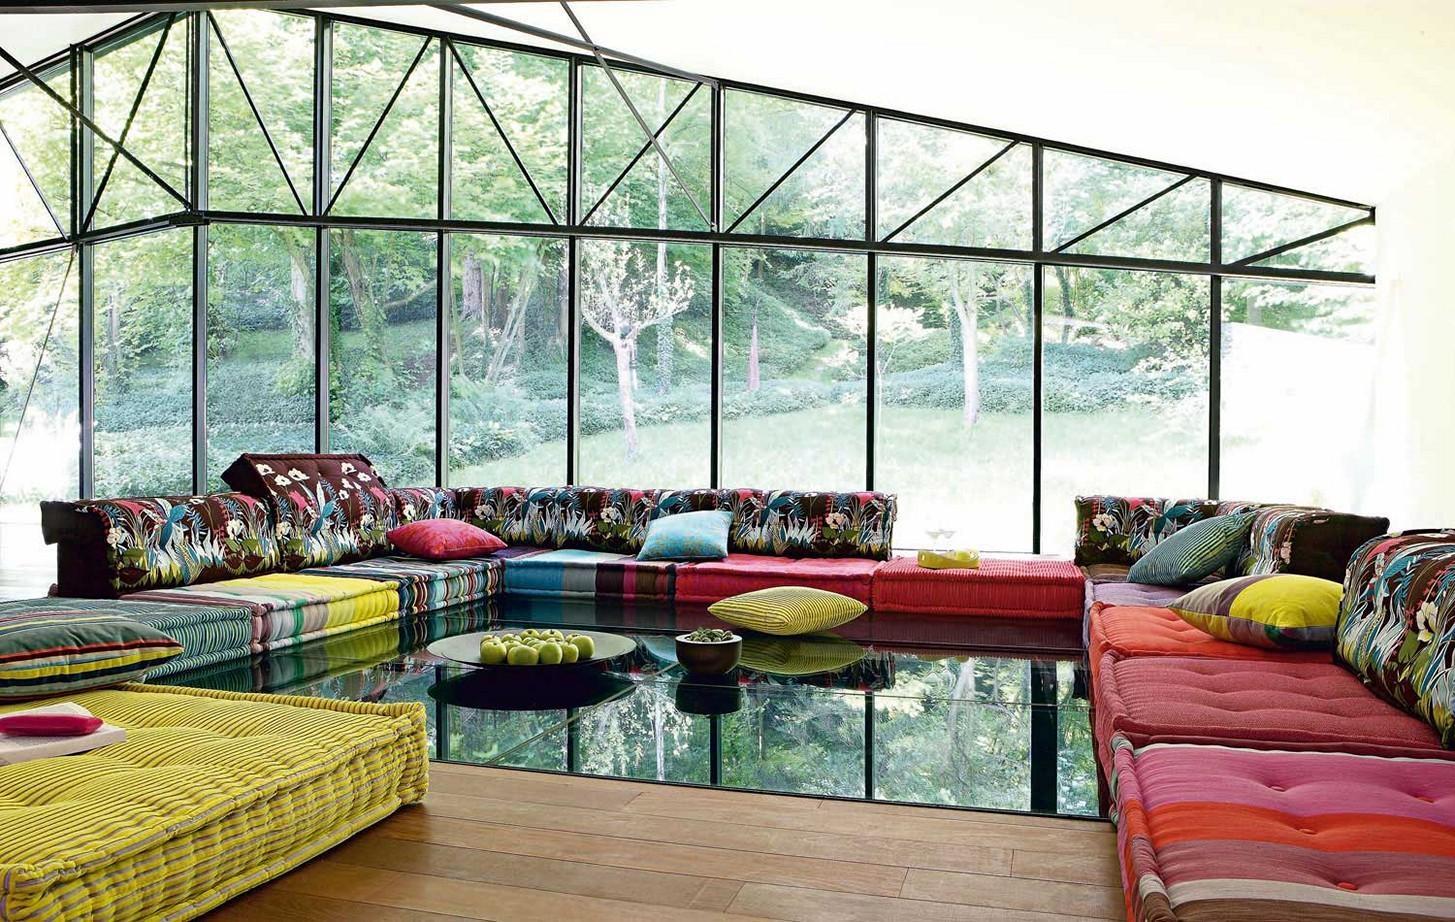 Floor Couch Cushions Regarding Floor Cushion Sofas (Image 8 of 20)